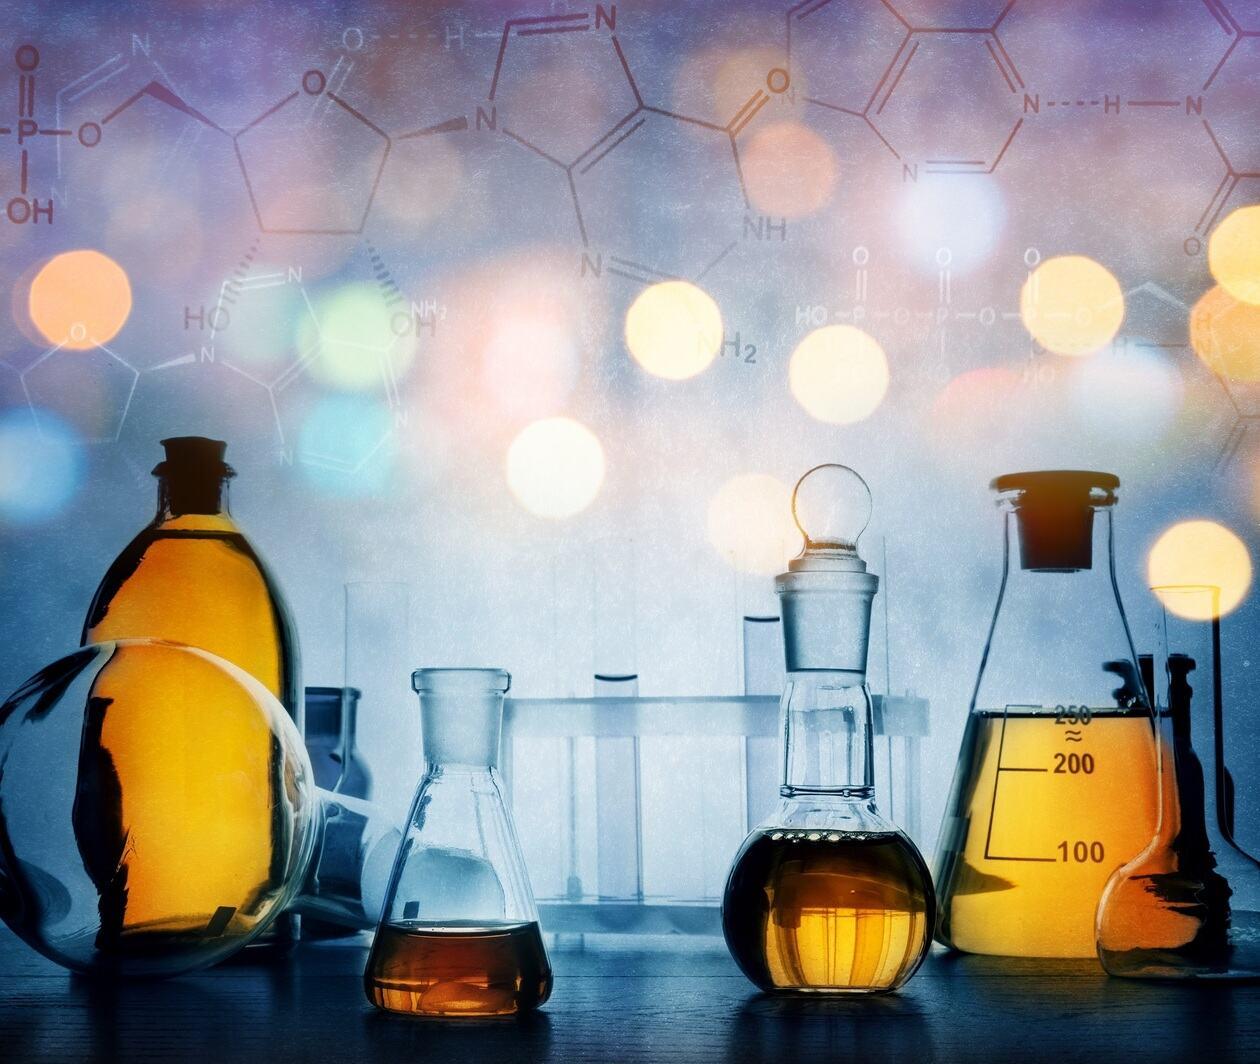 Exploring Everyday Chemistry